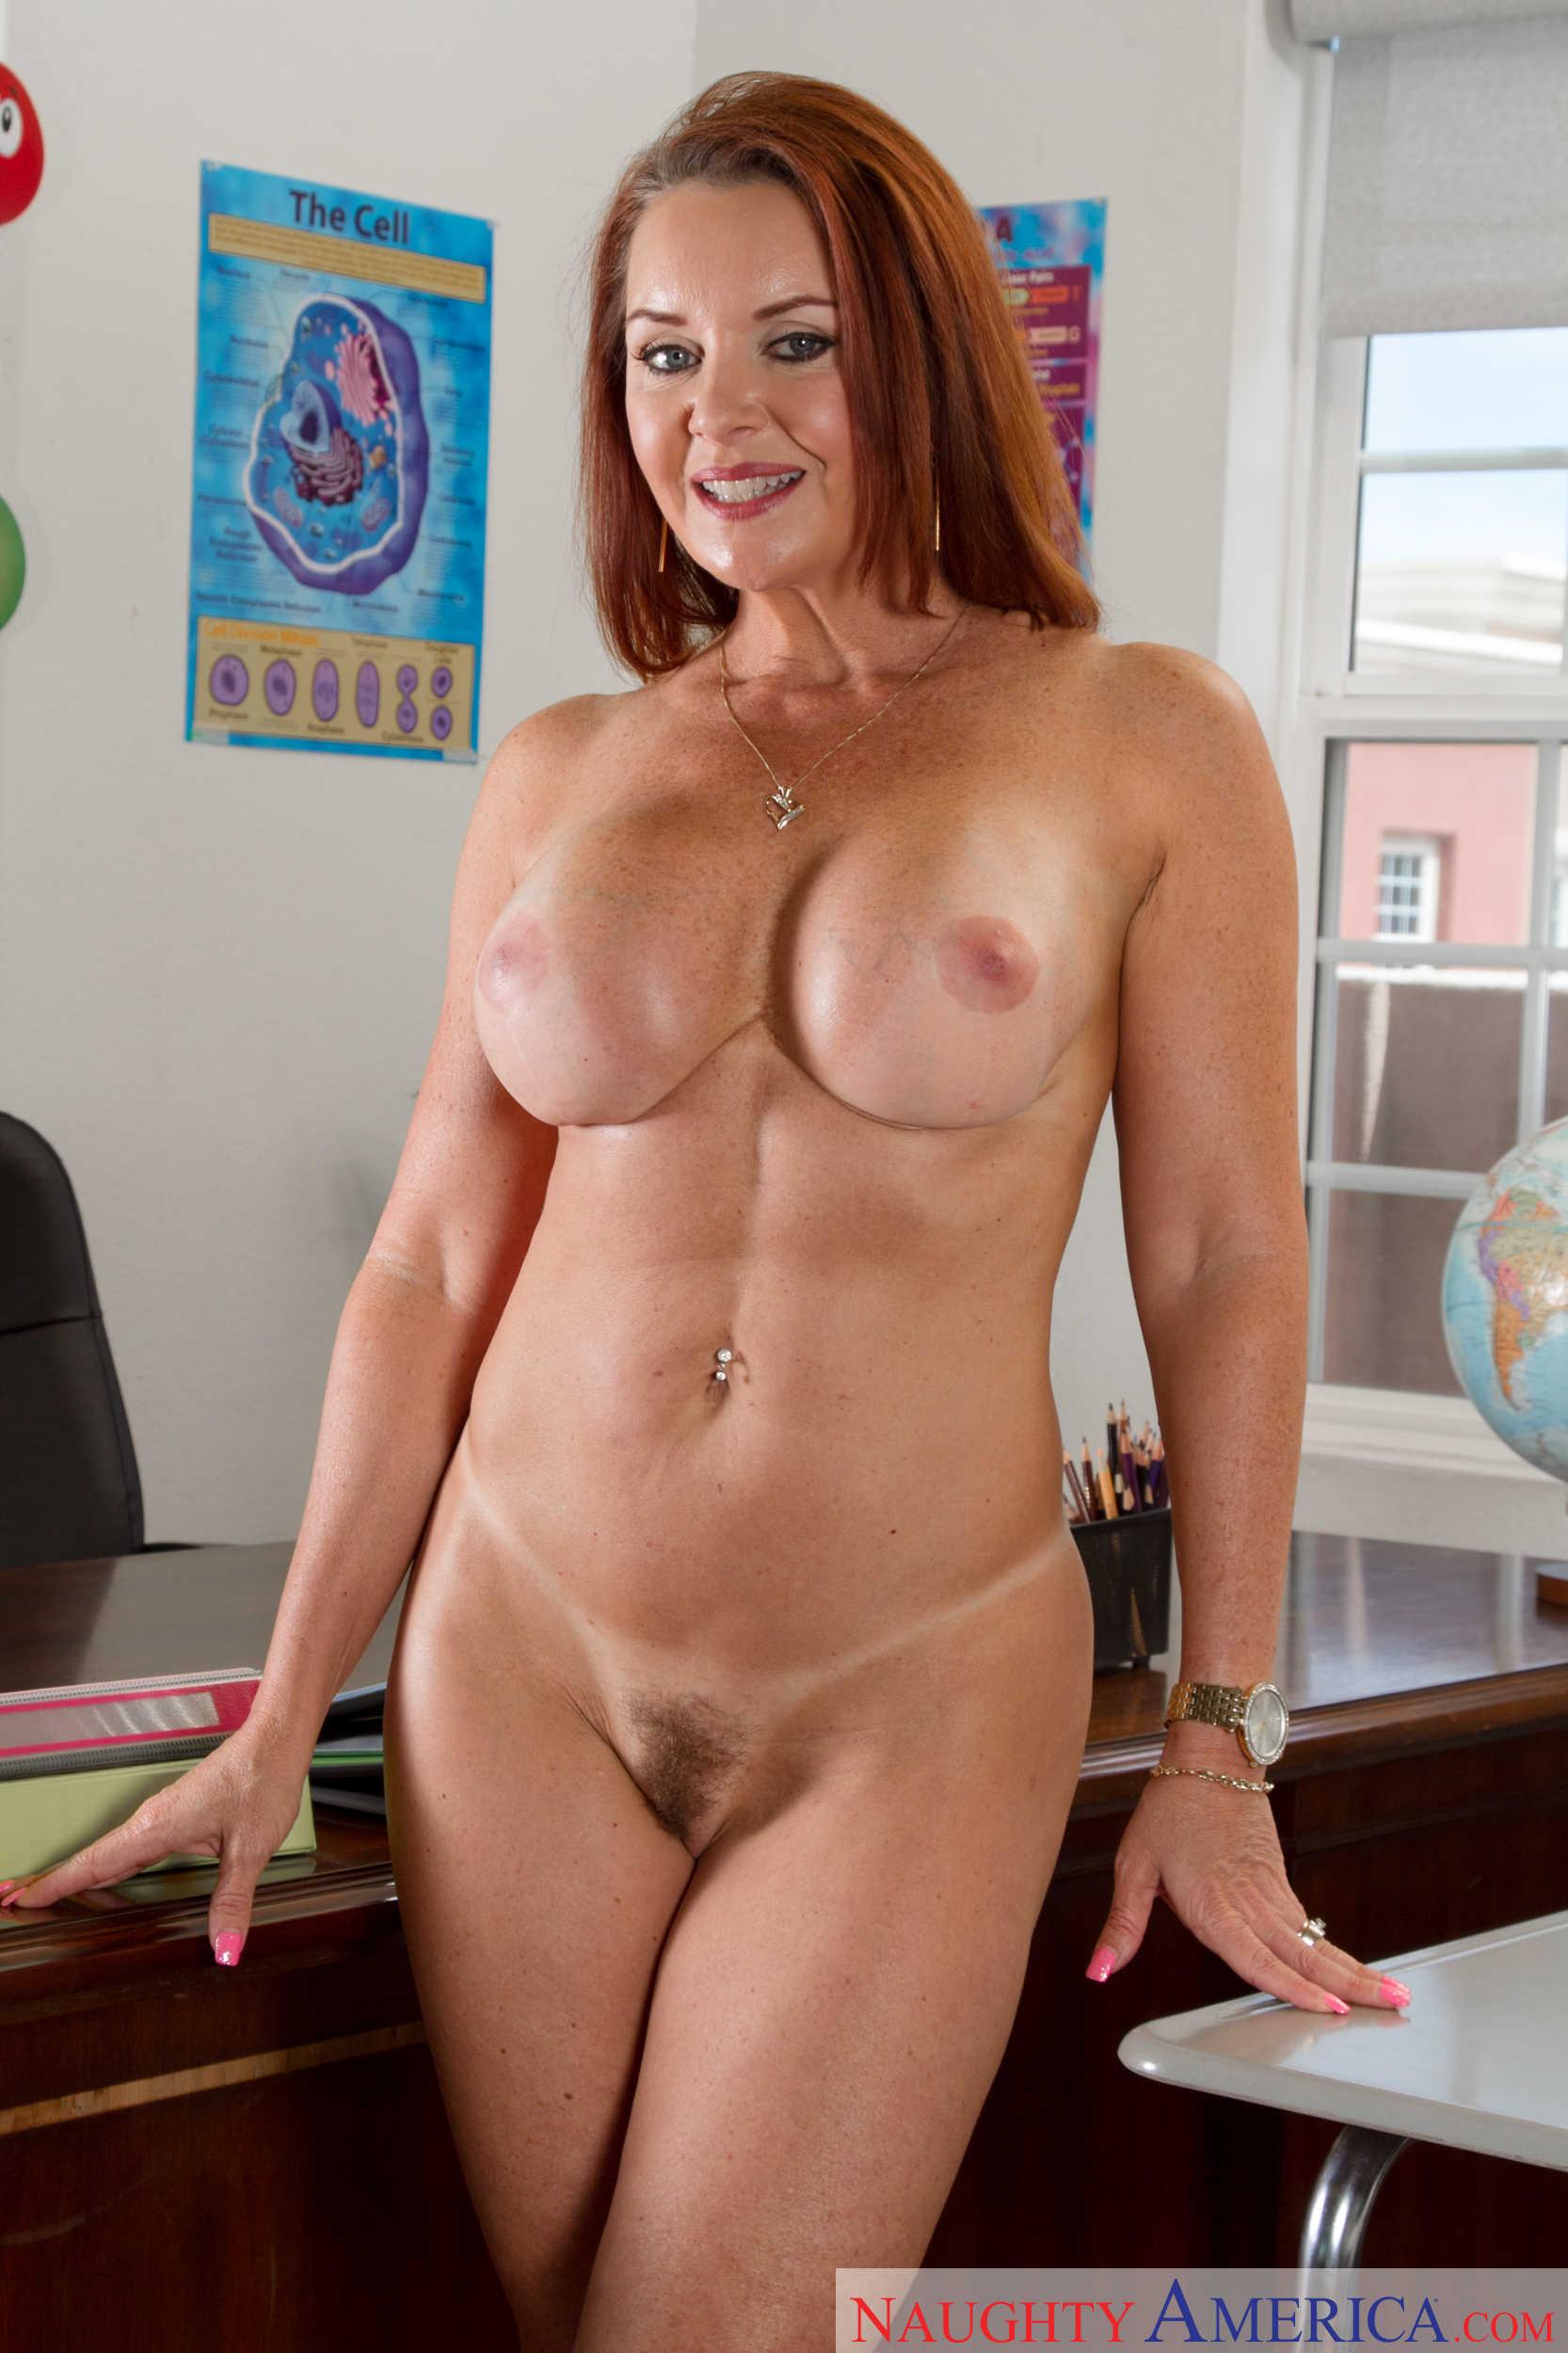 fine college girl nude